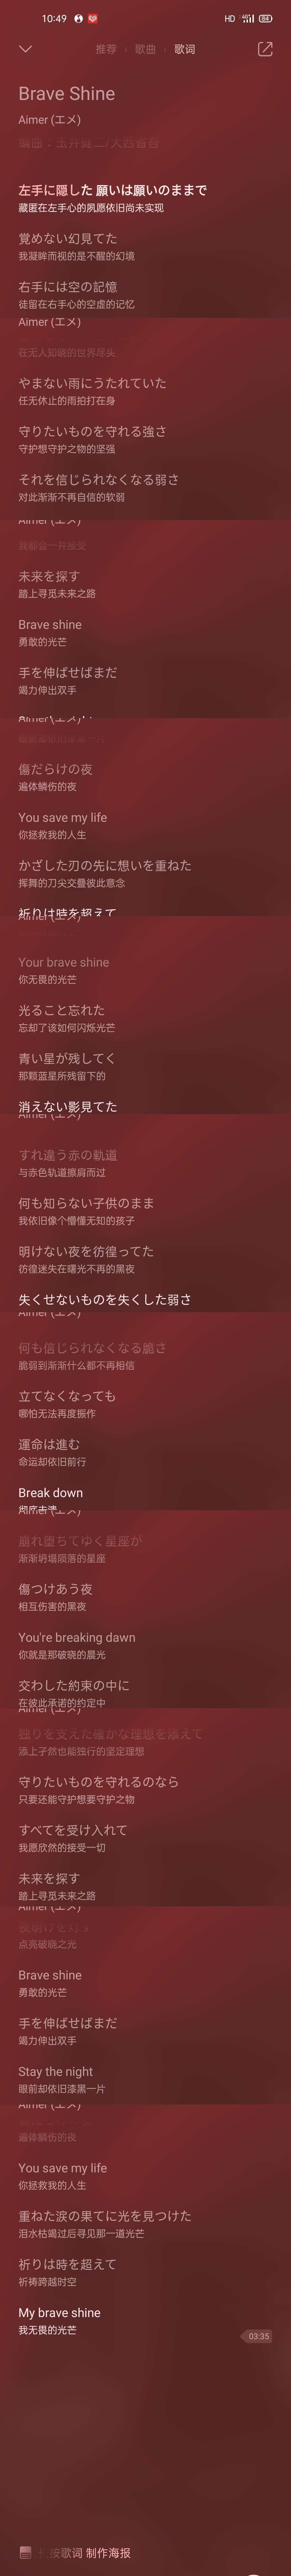 【音乐】brave shine-小柚妹站